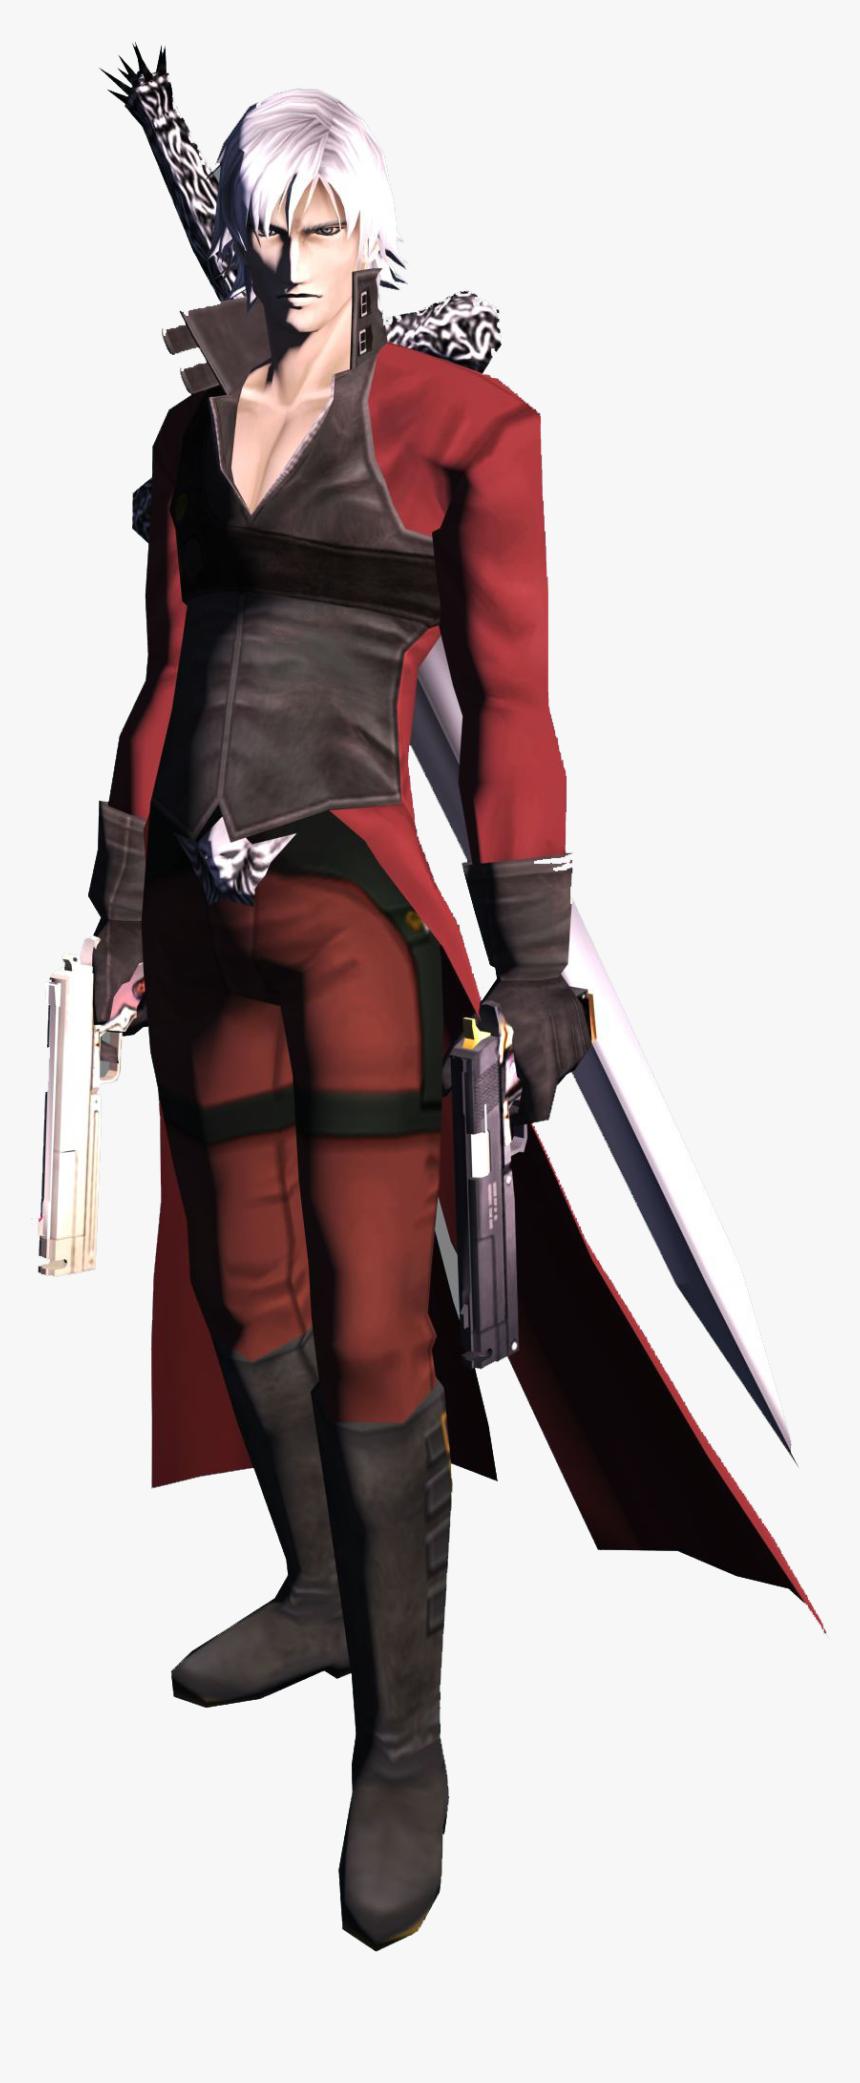 Devil May Cry 2 Dante Design Hd Png Download Kindpng